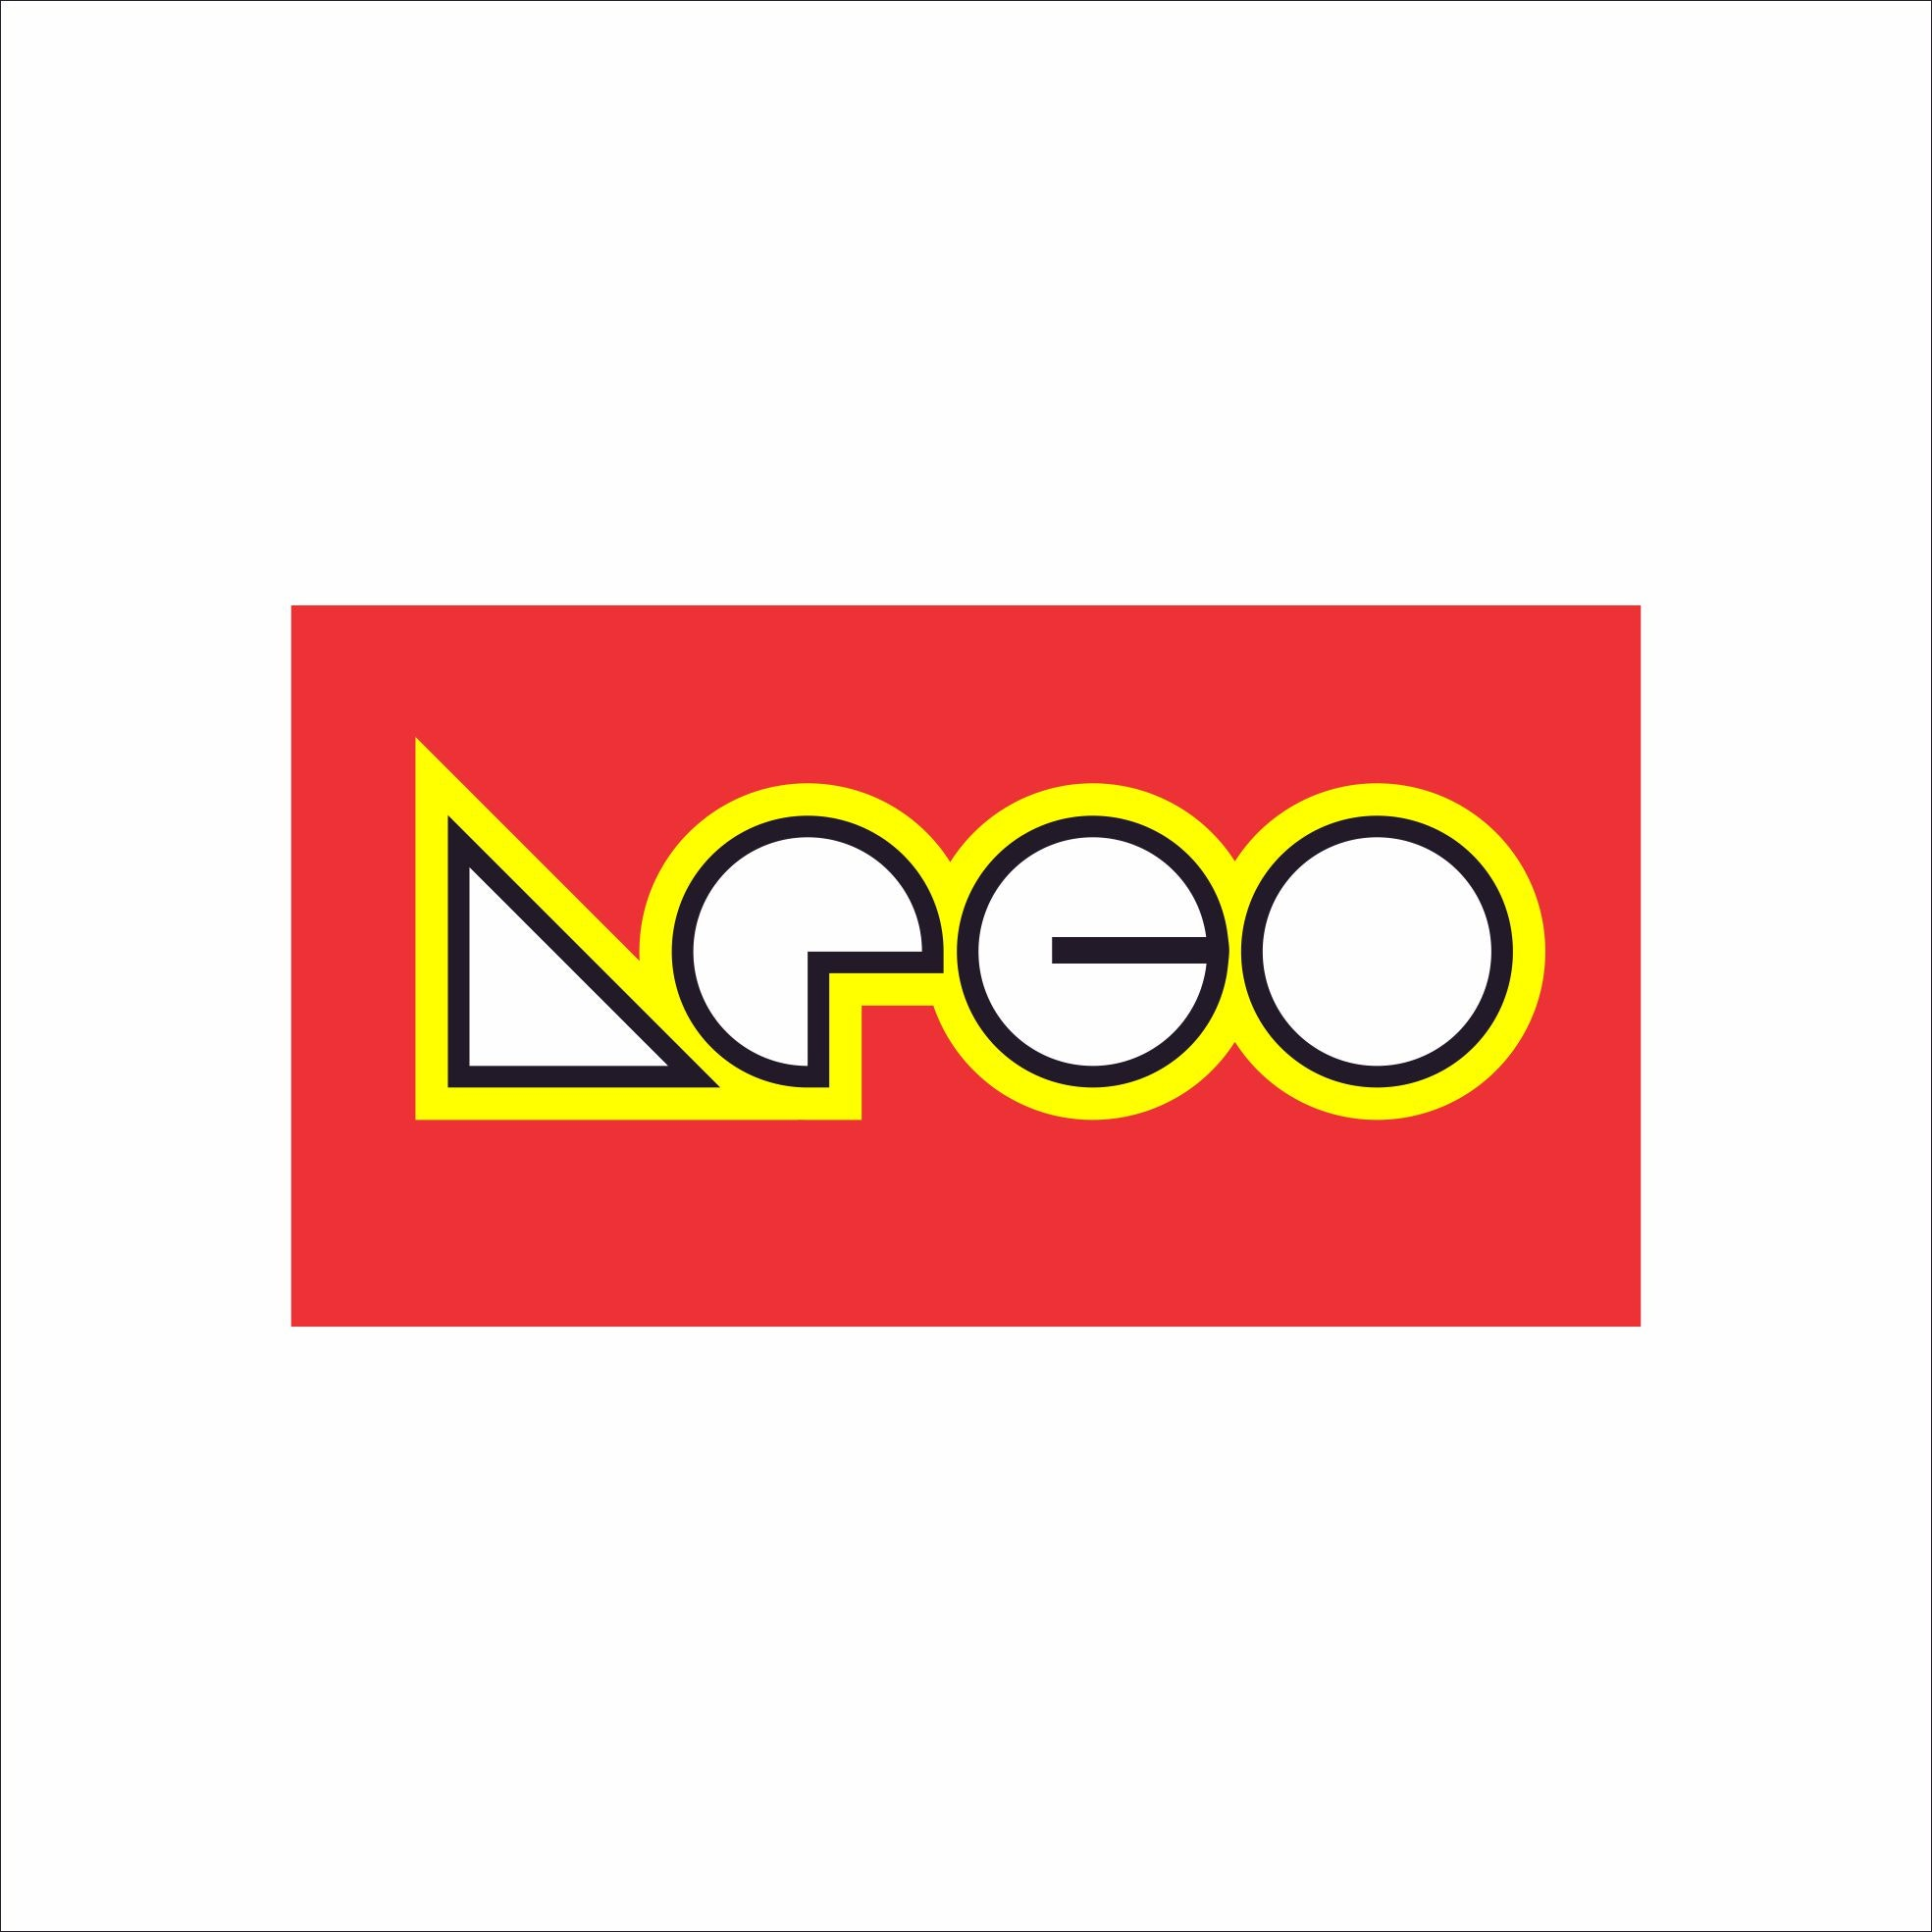 Lego logo in Bauhaus design style